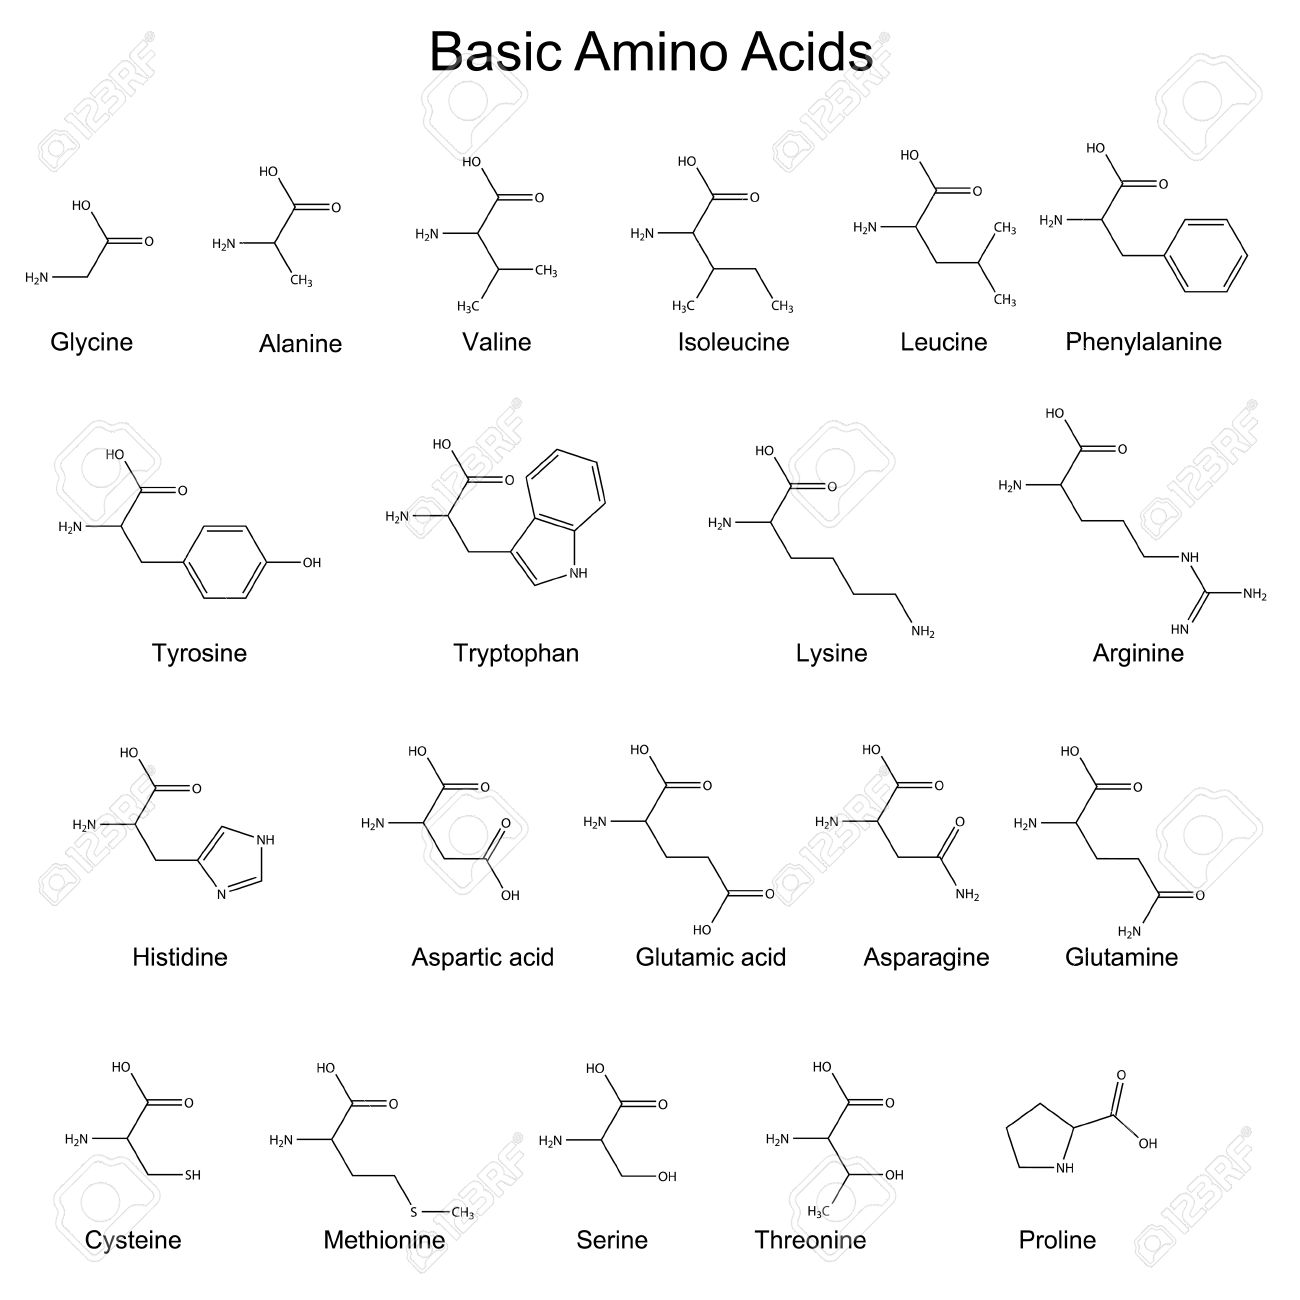 Skeletal structures of basic amino acids 2d vector royalty free skeletal structures of basic amino acids 2d vector stock vector 36036526 thecheapjerseys Gallery